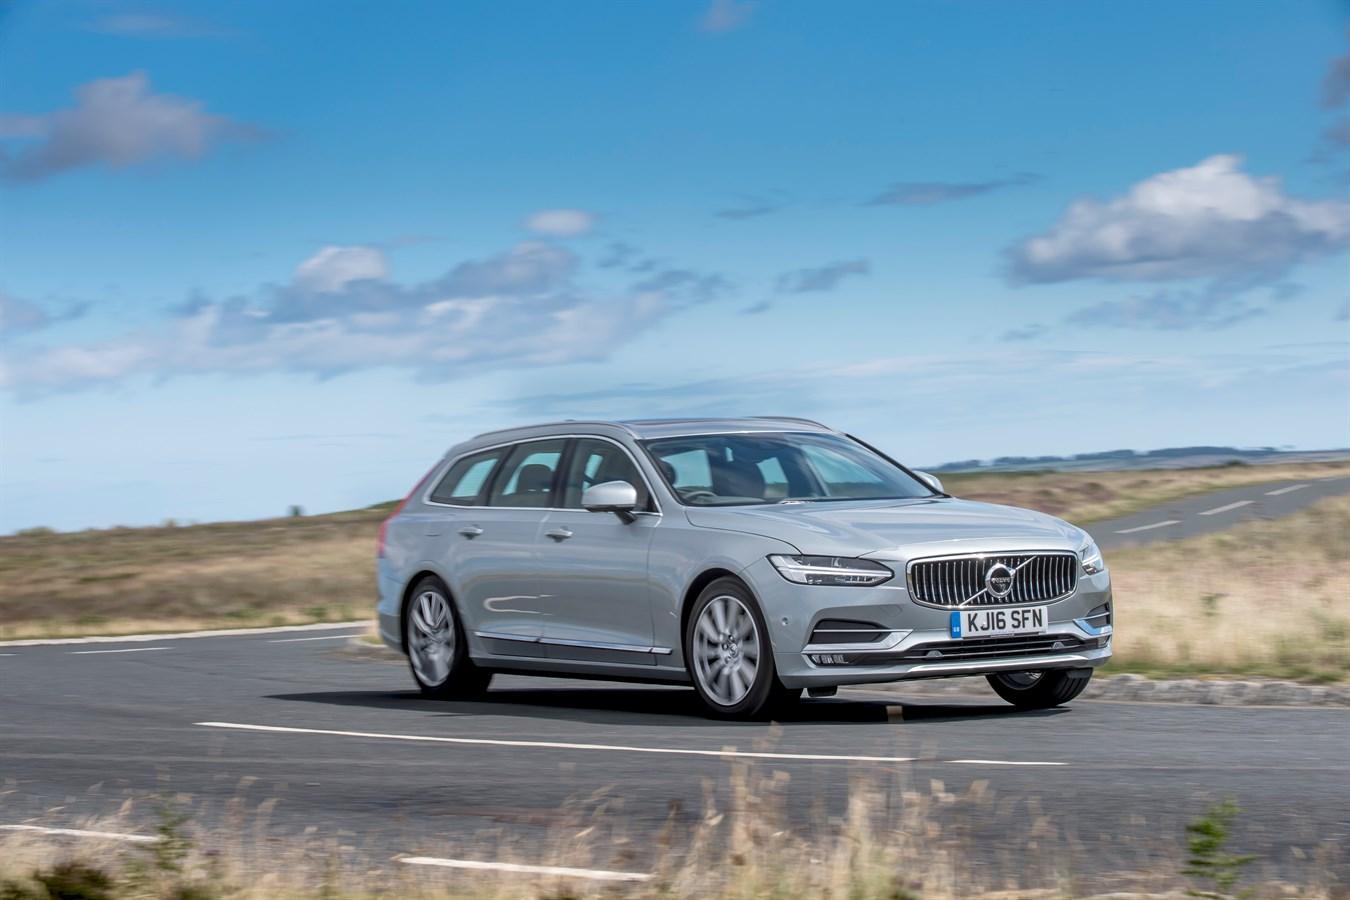 Volvo V90 Crowned Best Estate In Uk Car Of The Year Awards 2017 Media Newsroom